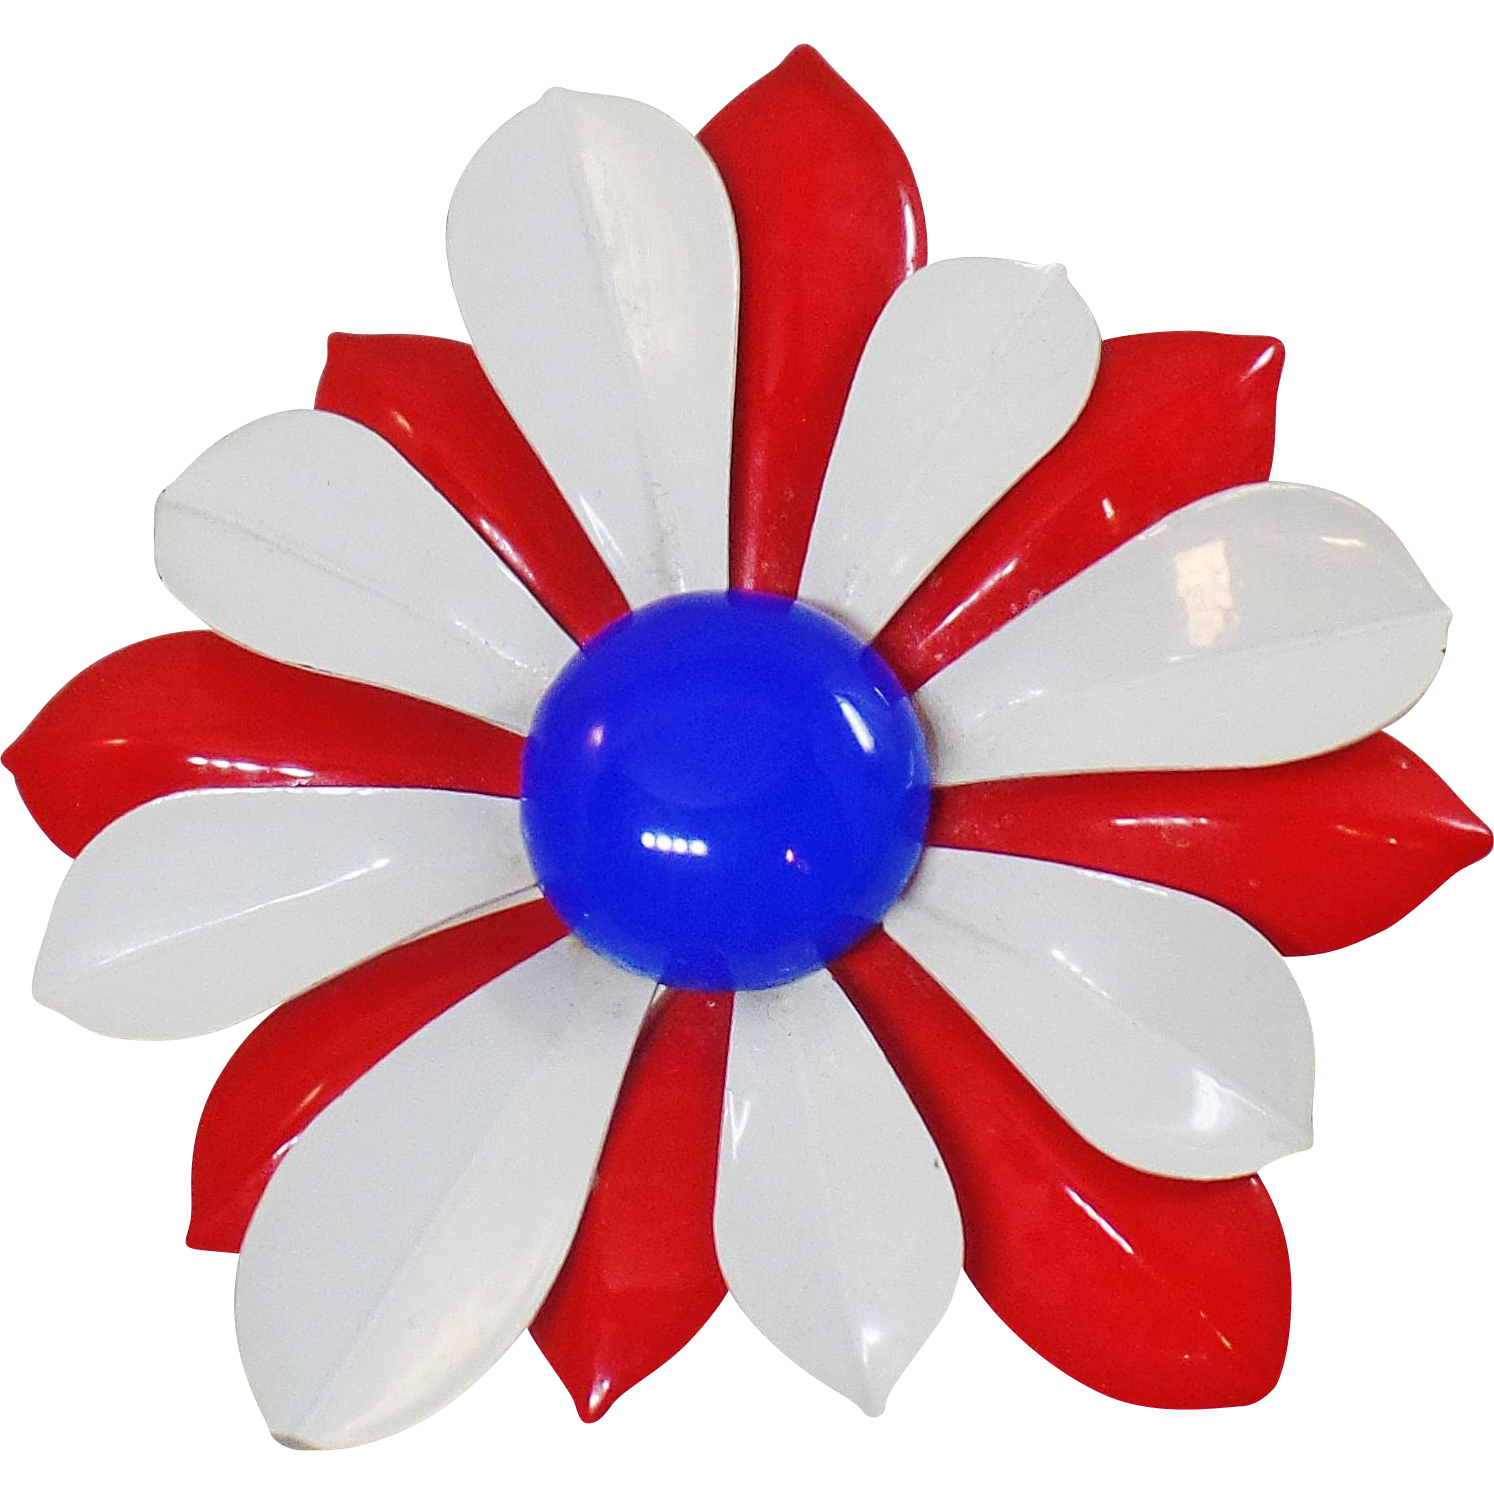 Vintage Large Red White Blue Flower Brooch. Mod Patriotic Flower Power Pin. USA Enamel Flower Brooch